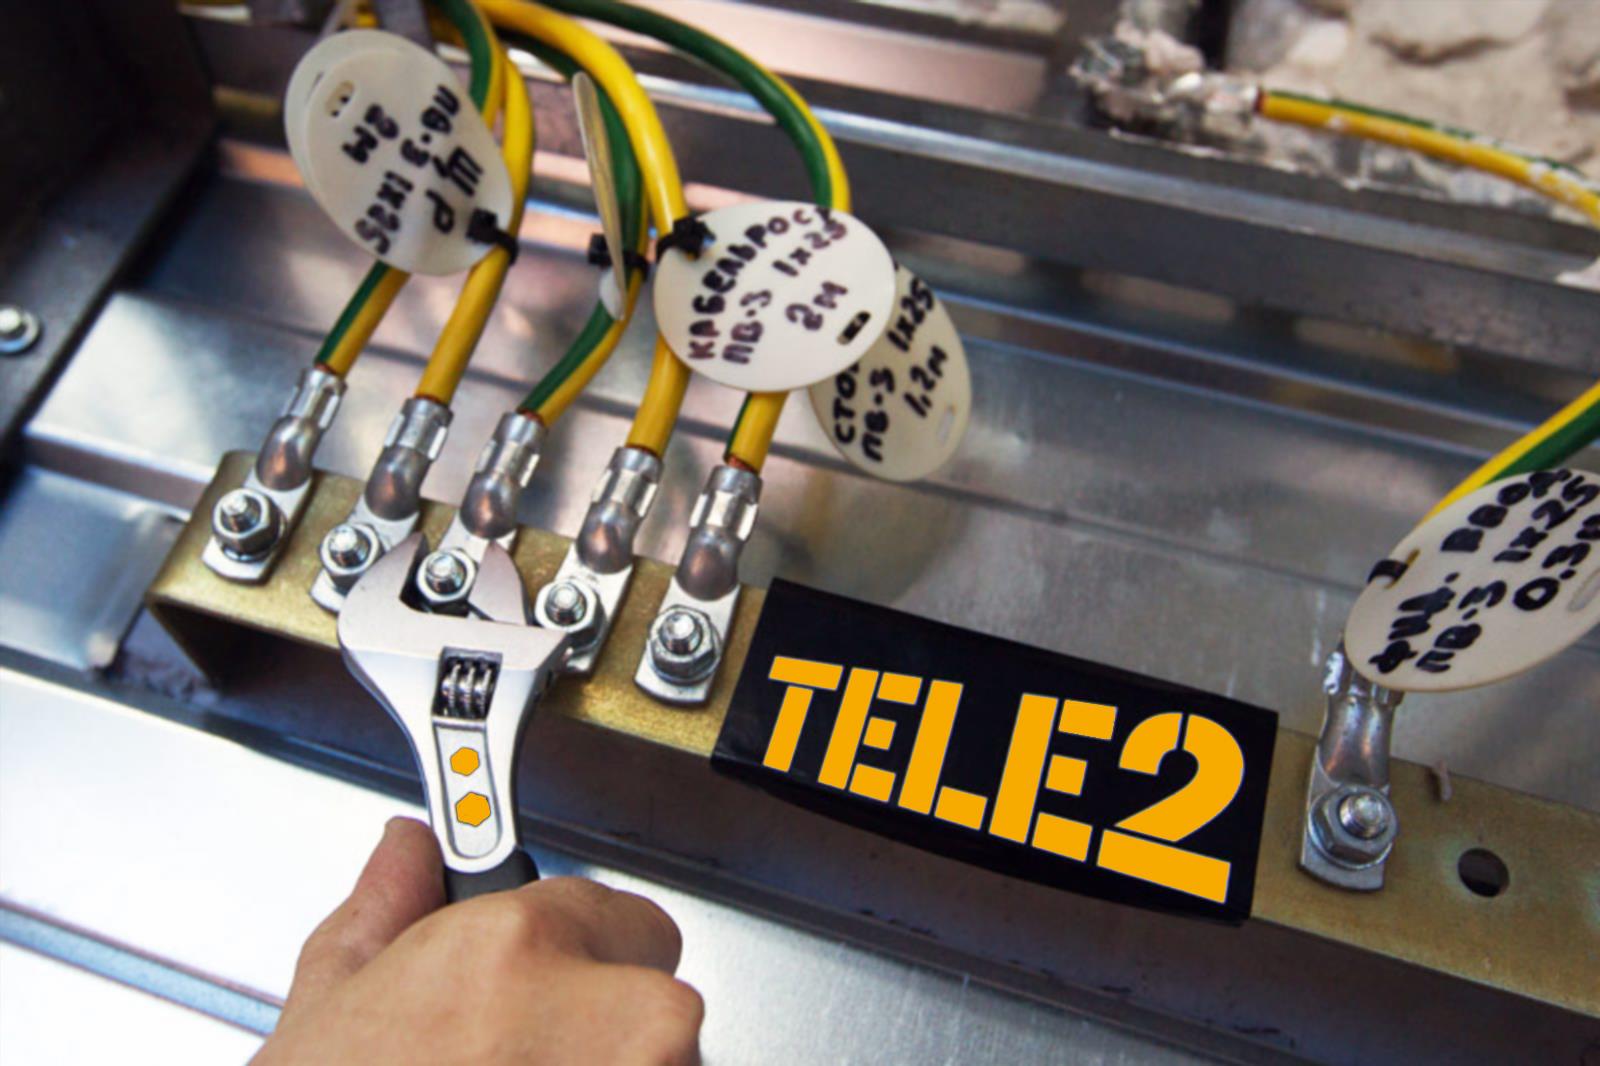 «Билайн» и Теле2 объединят сети в 27 регионах России